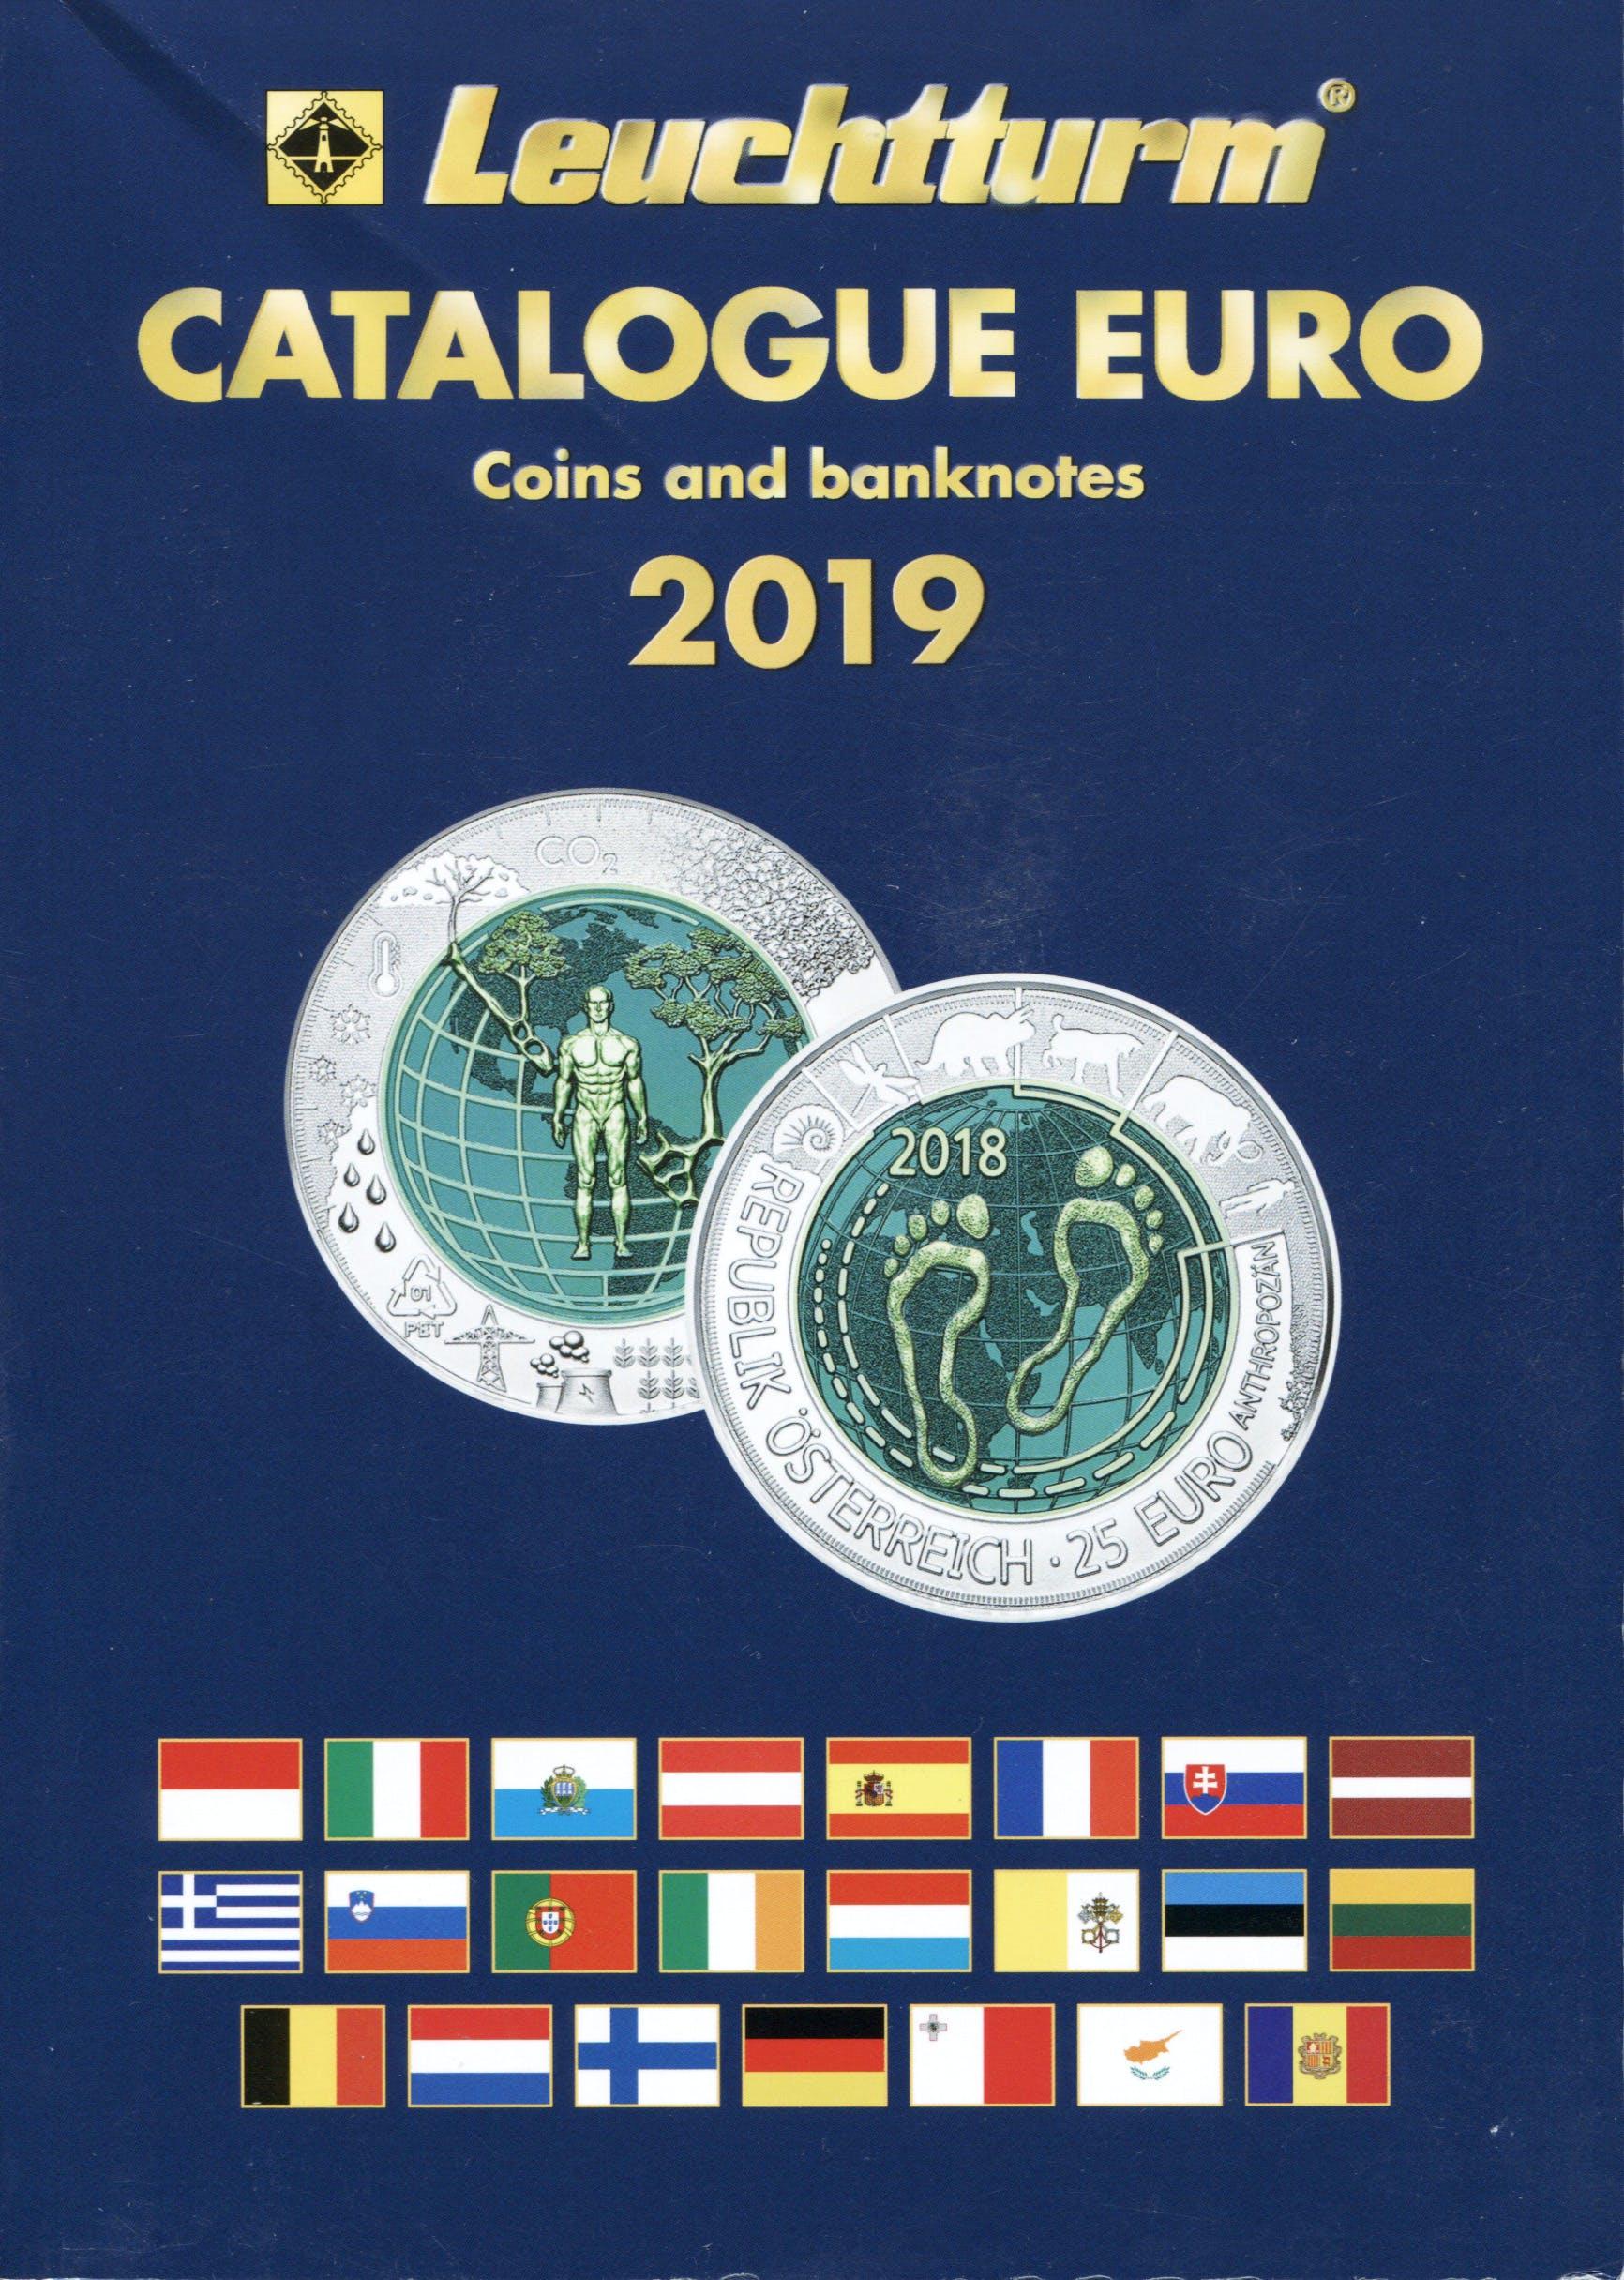 Euro Catalogue 2019 in the Token Publishing Shop